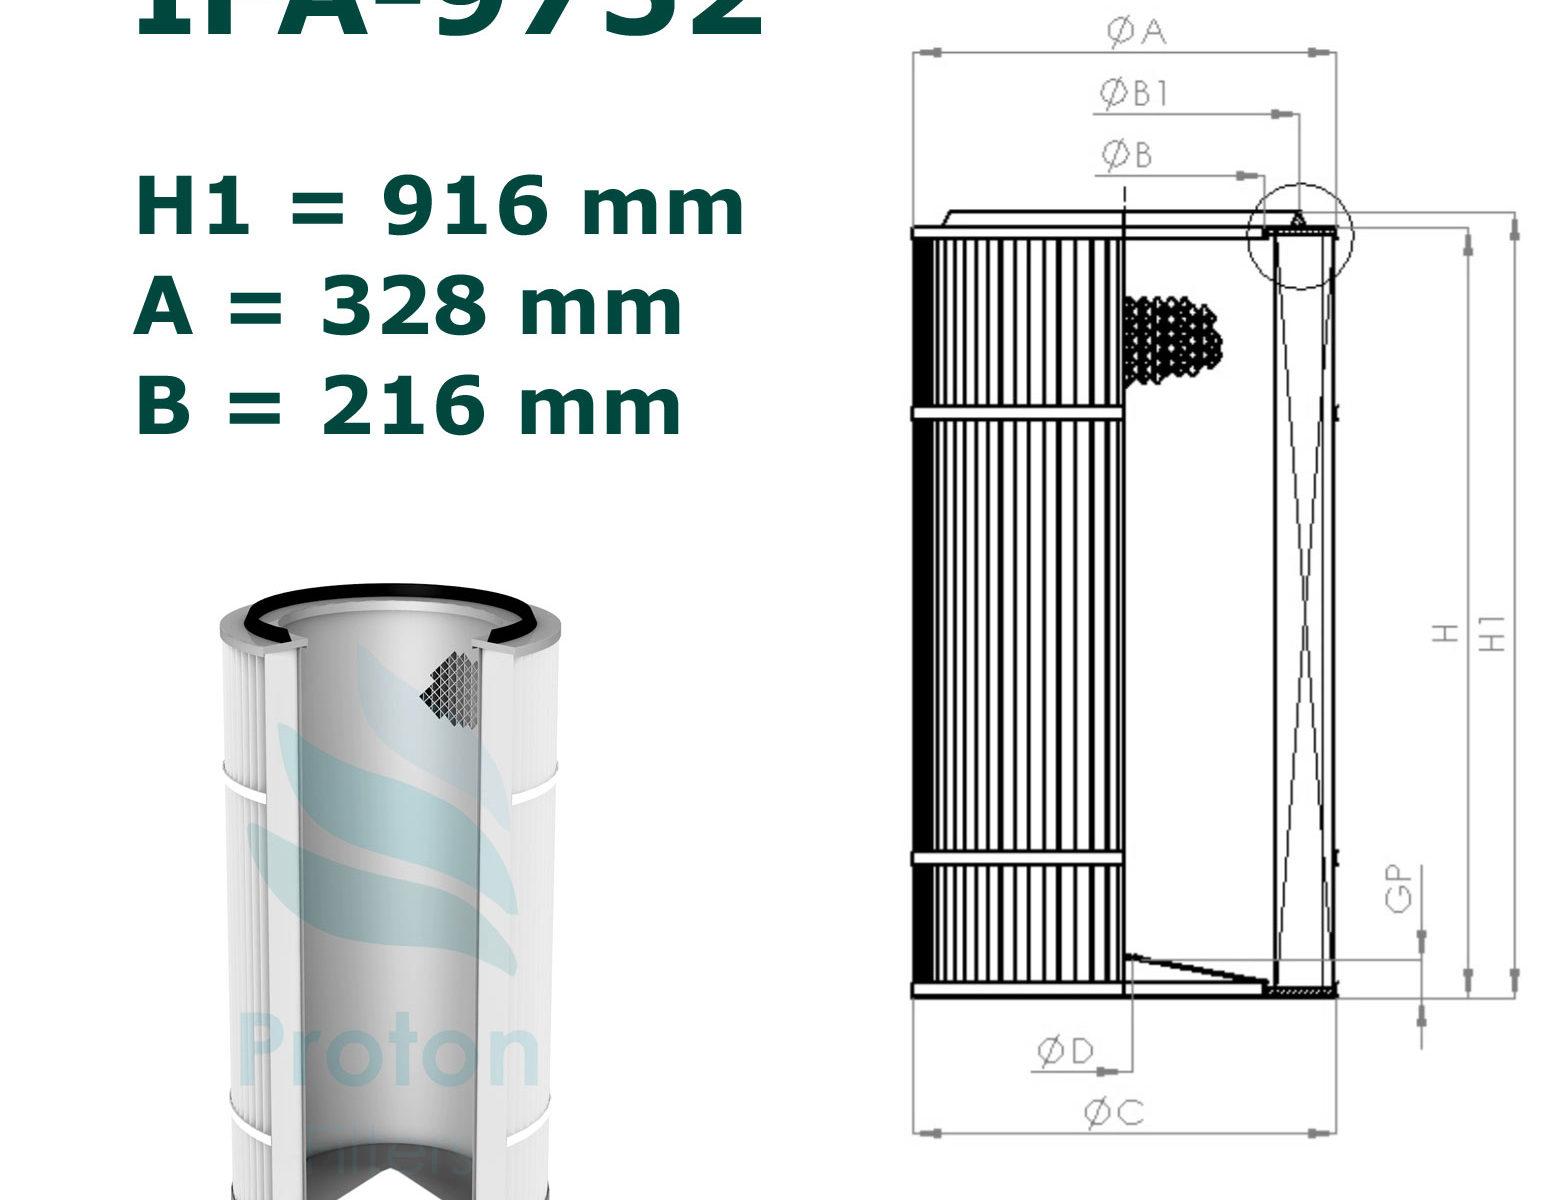 IFA-9752-1565x1200